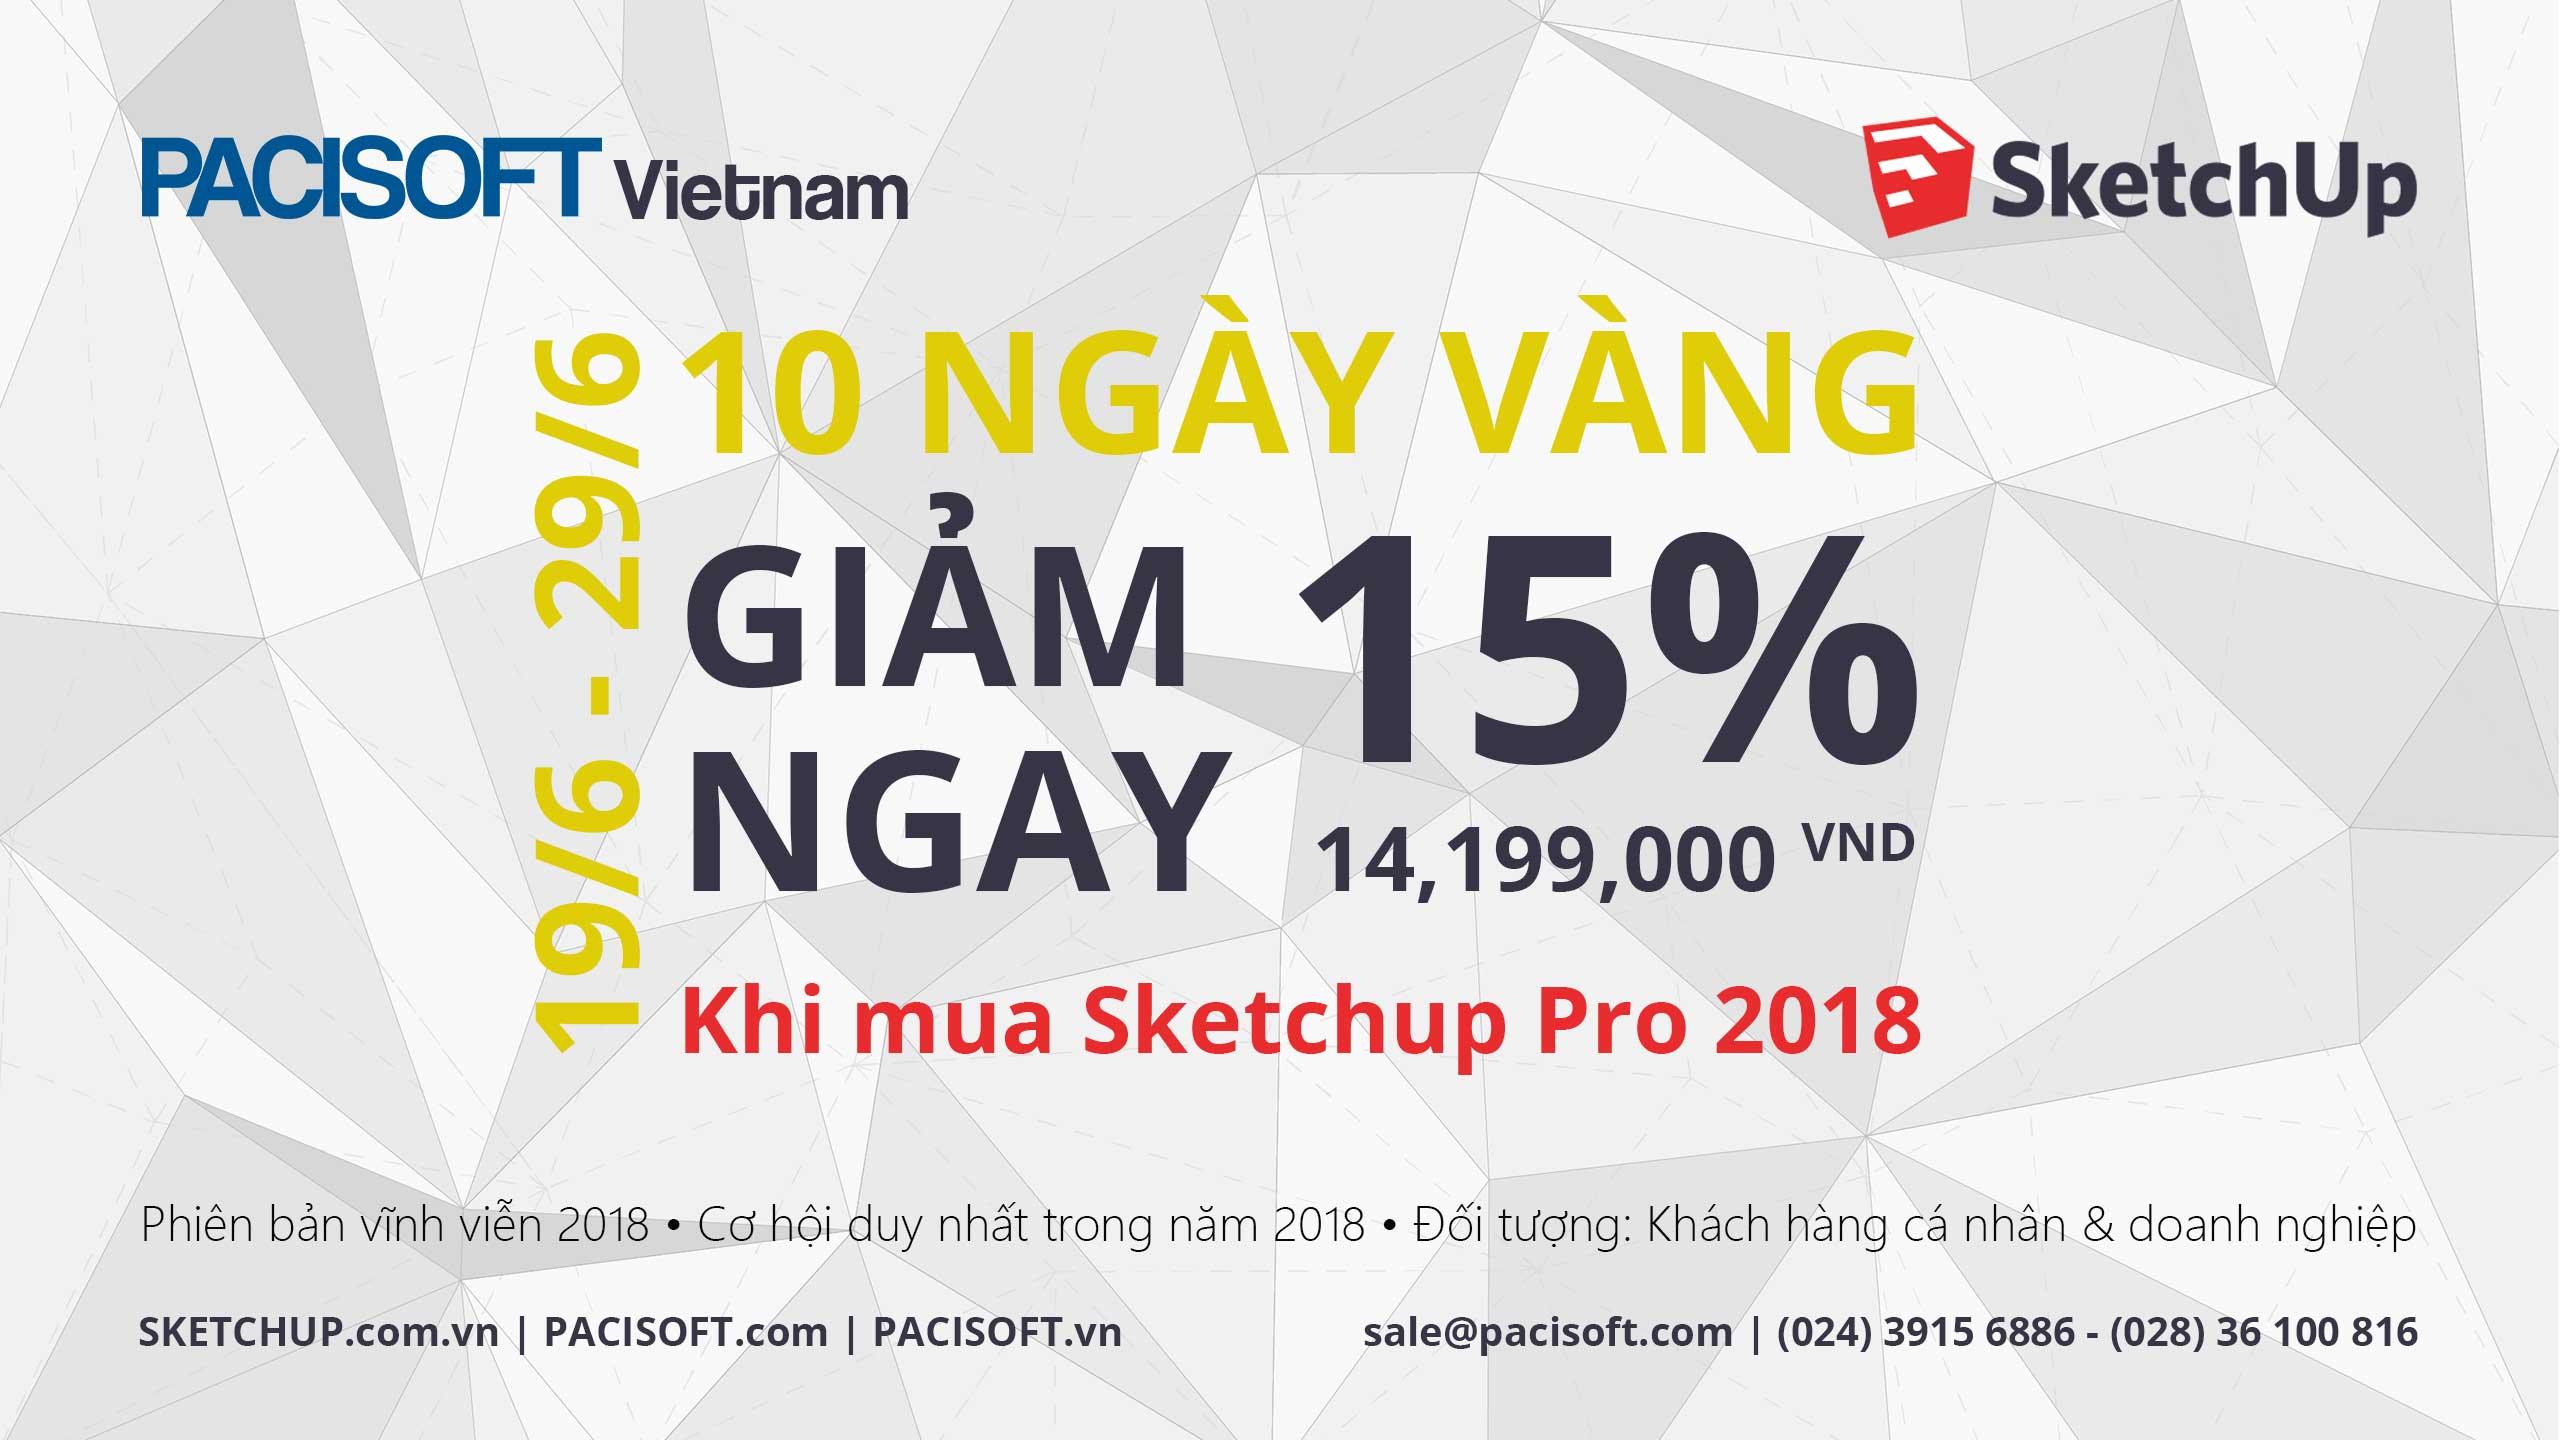 SketchUp Pro khuyen mai